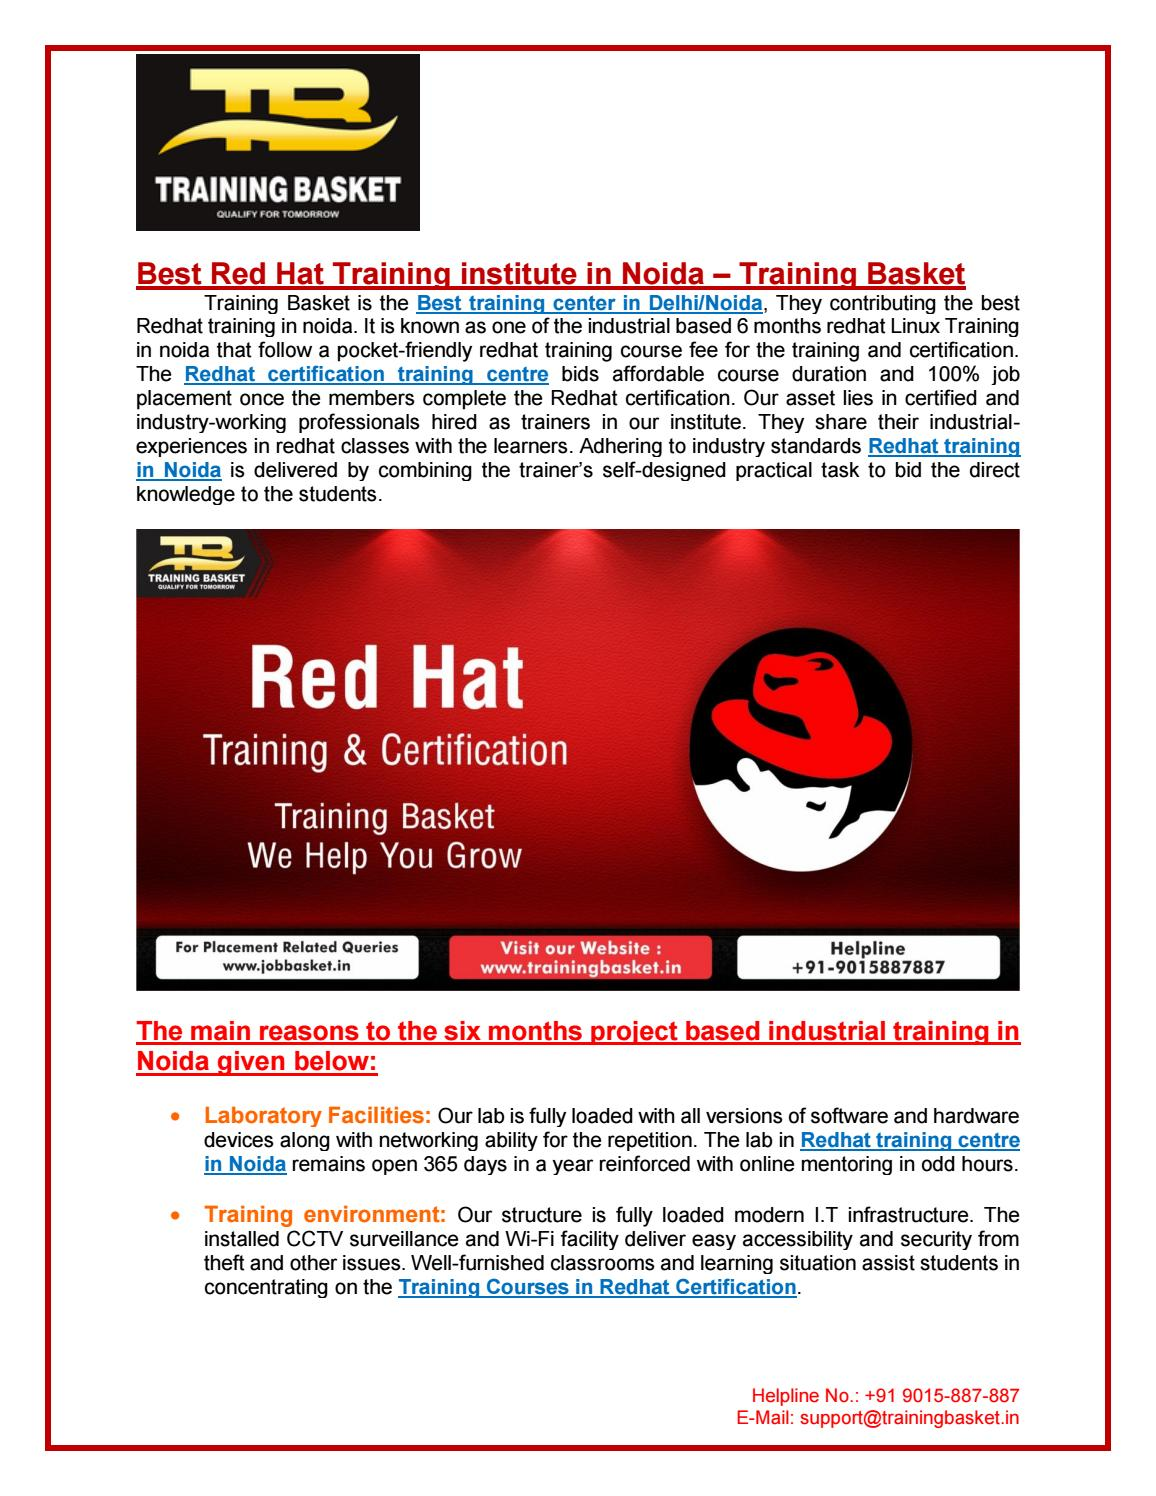 Best Red Hat Training Institute in Noida   Training Basket